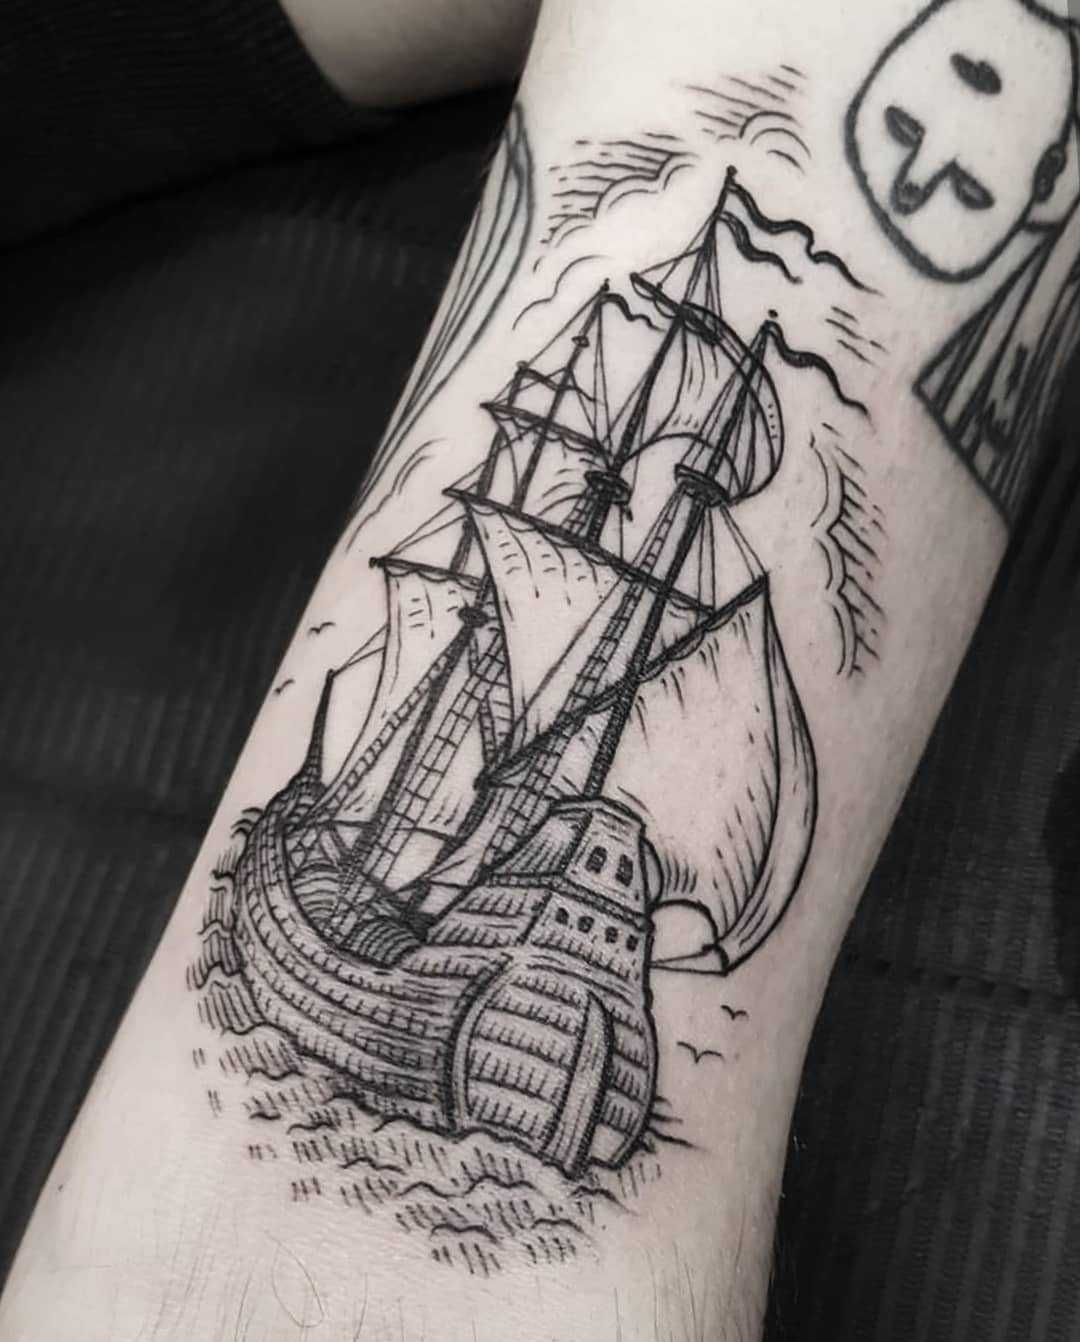 Blackwork ship tattoo on the arm